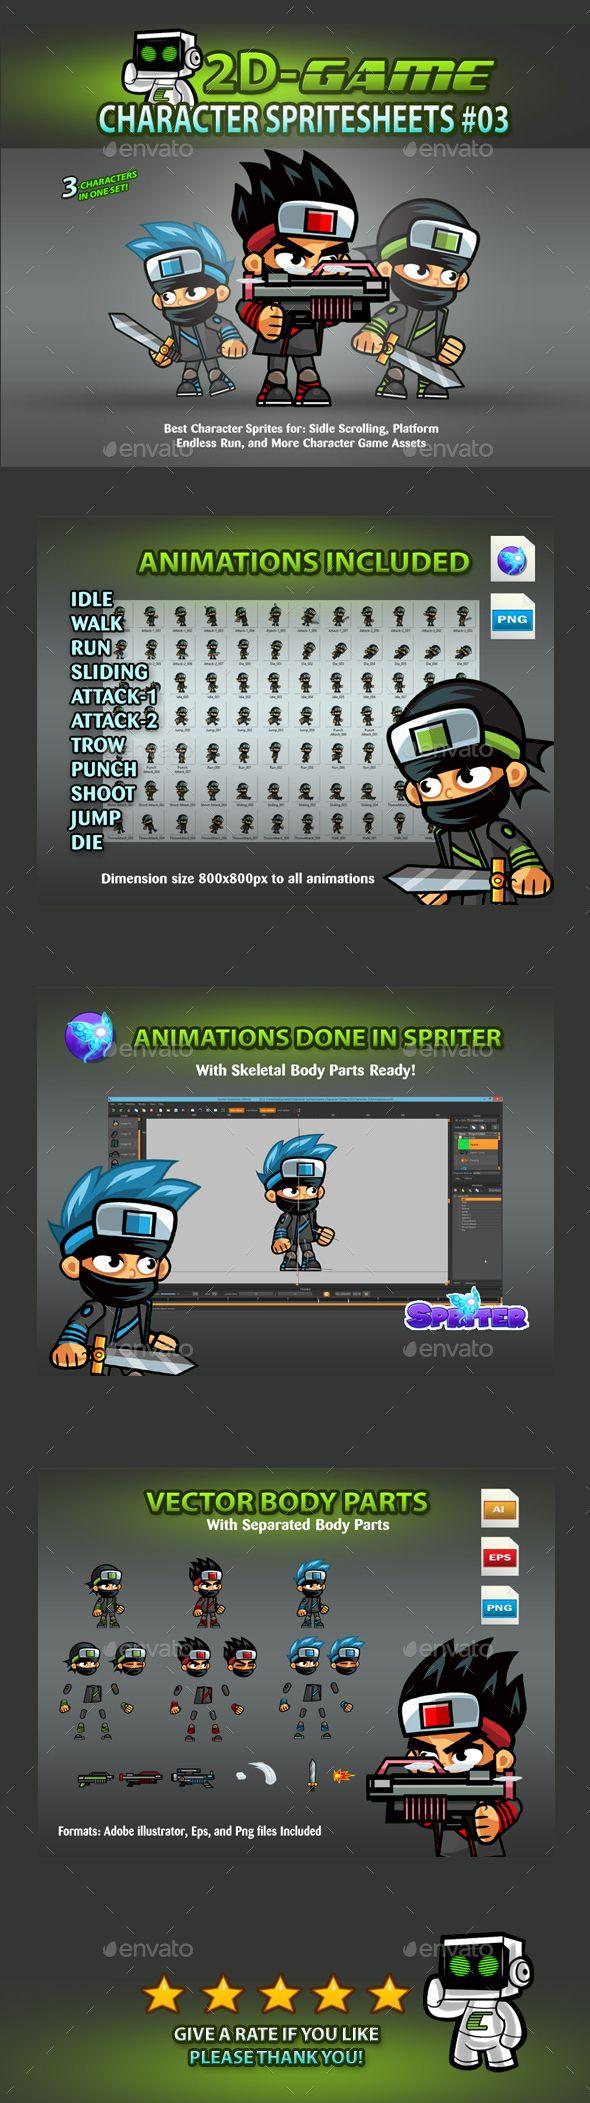 German company builds the ultimate indoor cat walkway softpedia - Ninja 2d Game Character Spritesheets 03